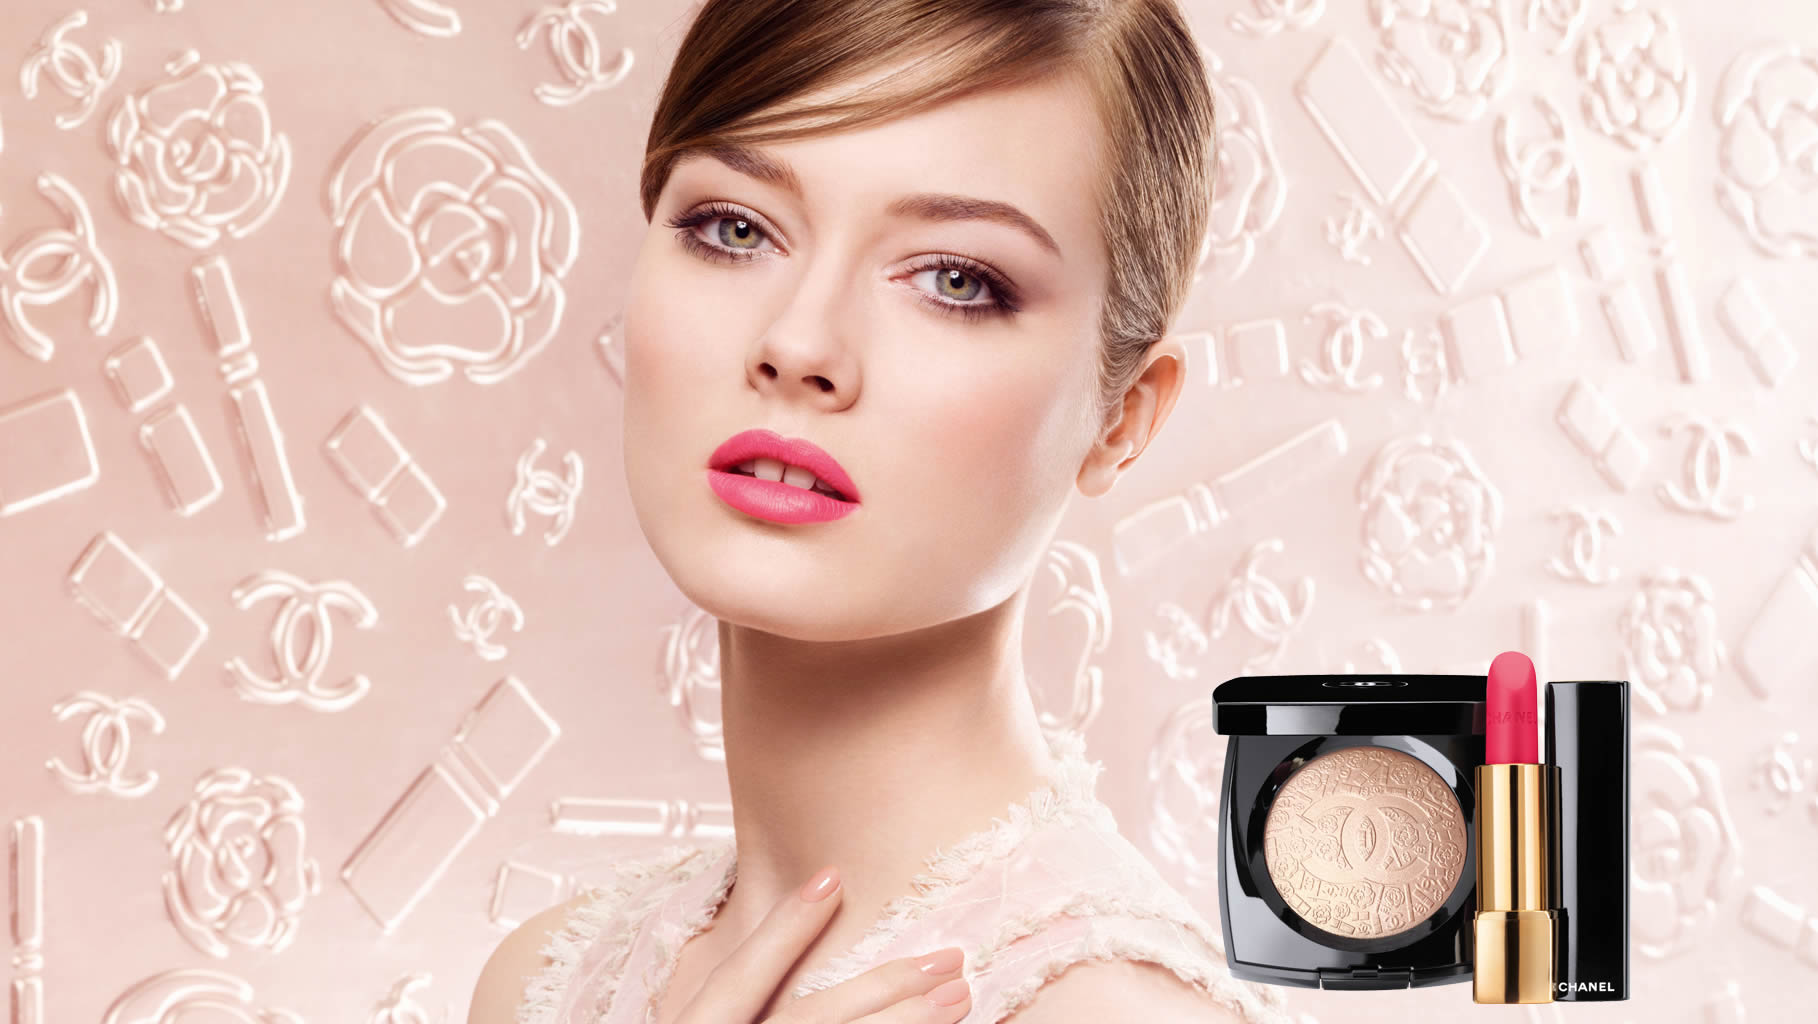 chanel-spring-makeup-2.jpg